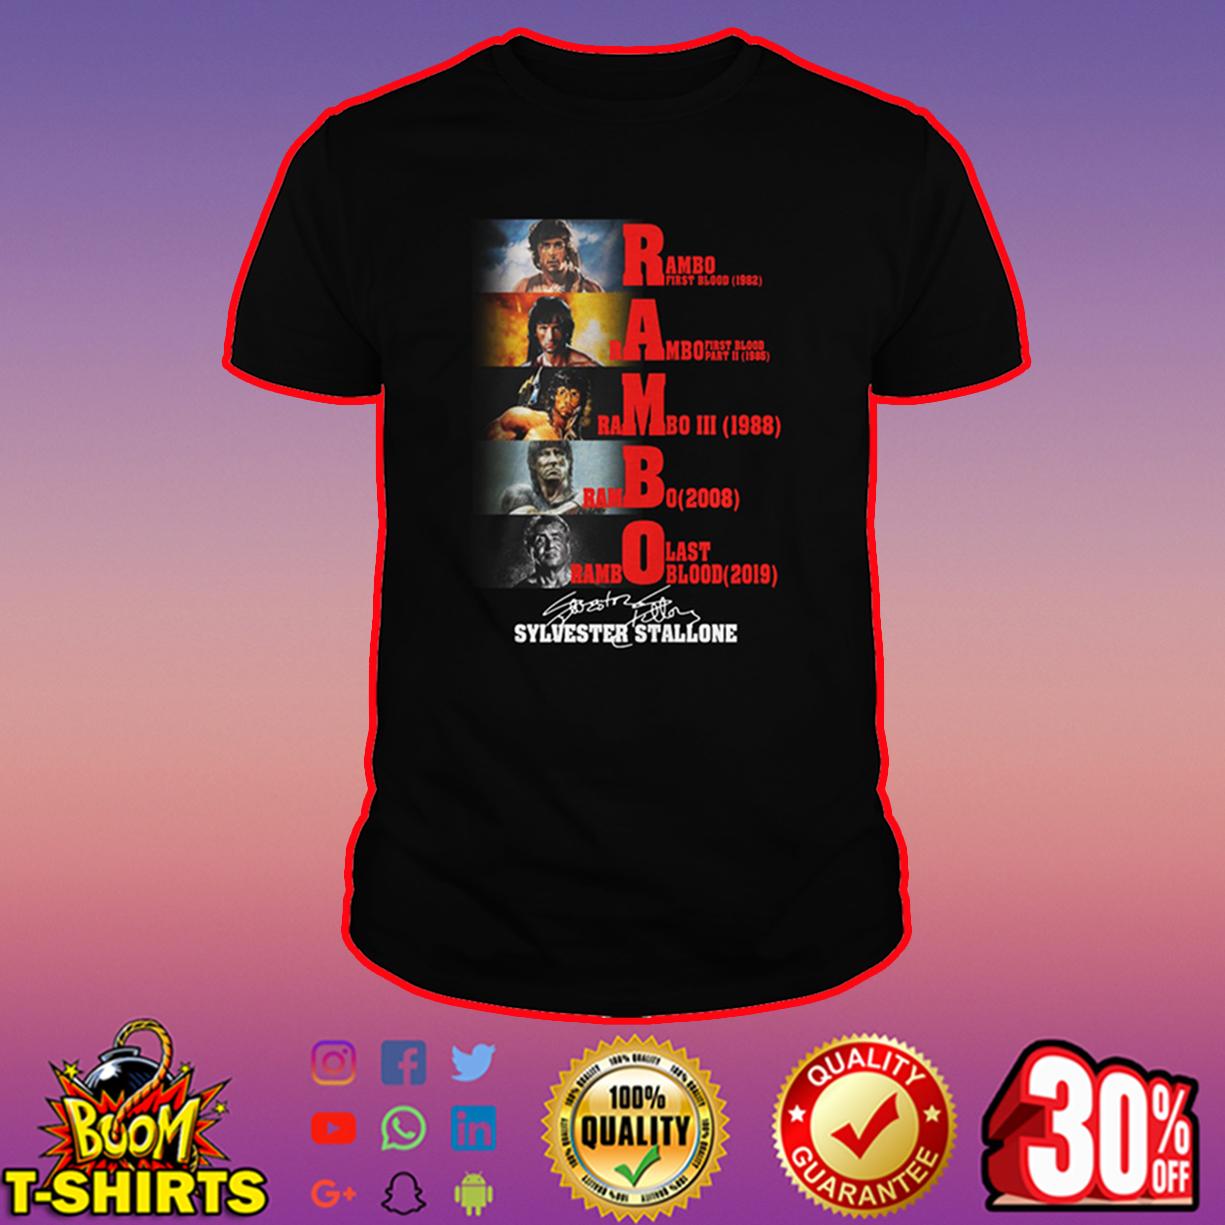 Rambo Sylvester Stallone Signature shirt